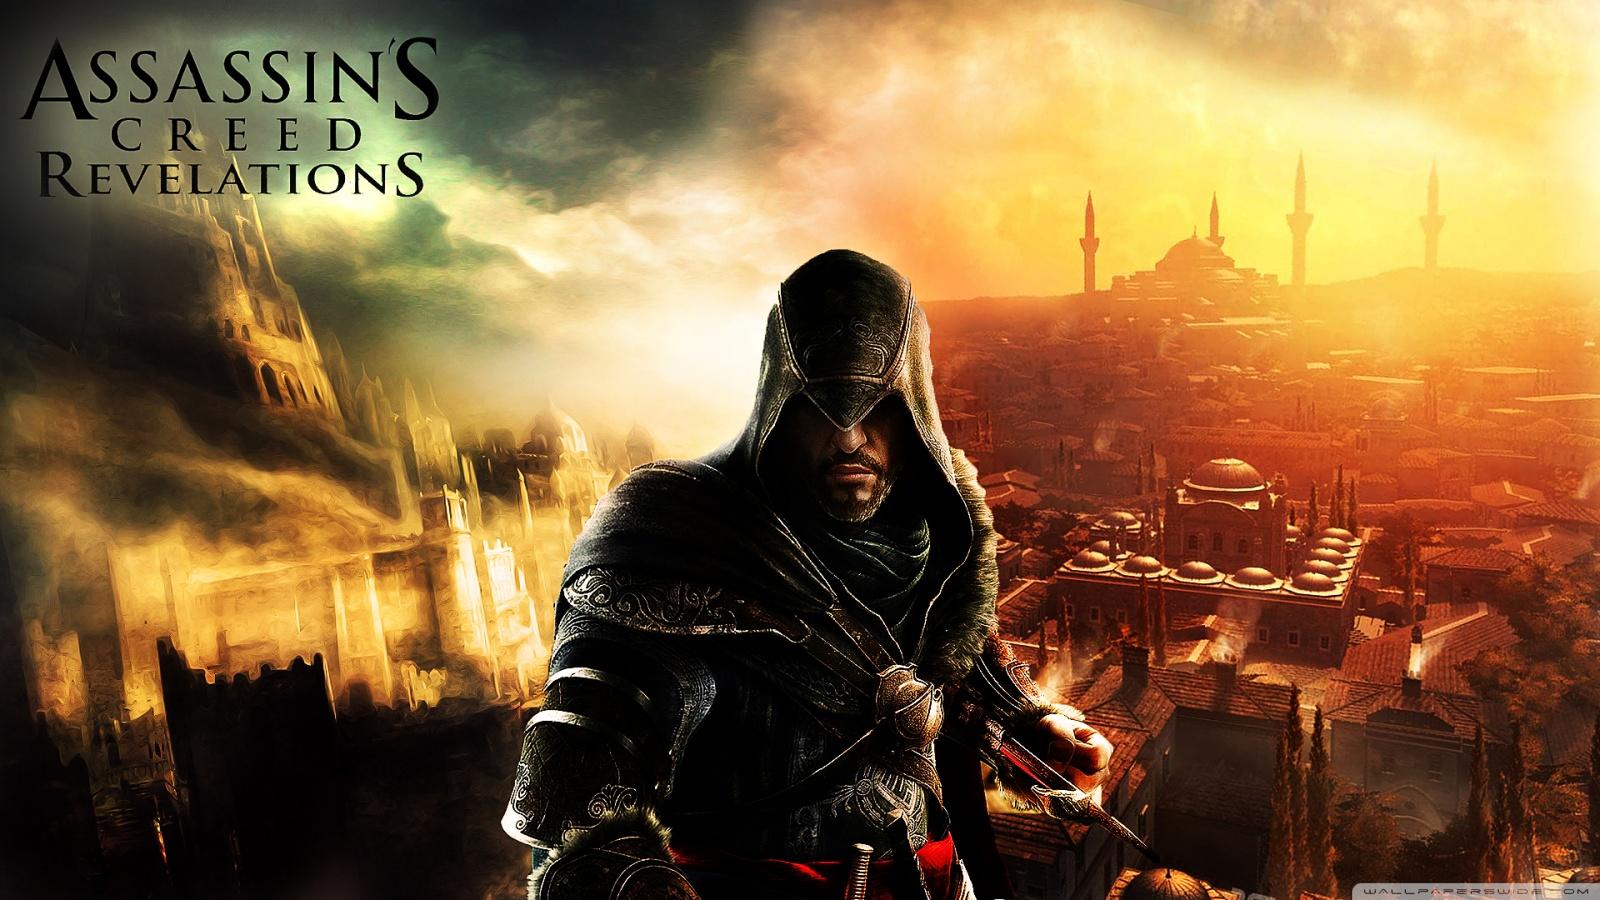 Assassins Creed Wallpaper 1080p: Freaking Spot: Assasin's Creed Full HD 1080p Wallpapers